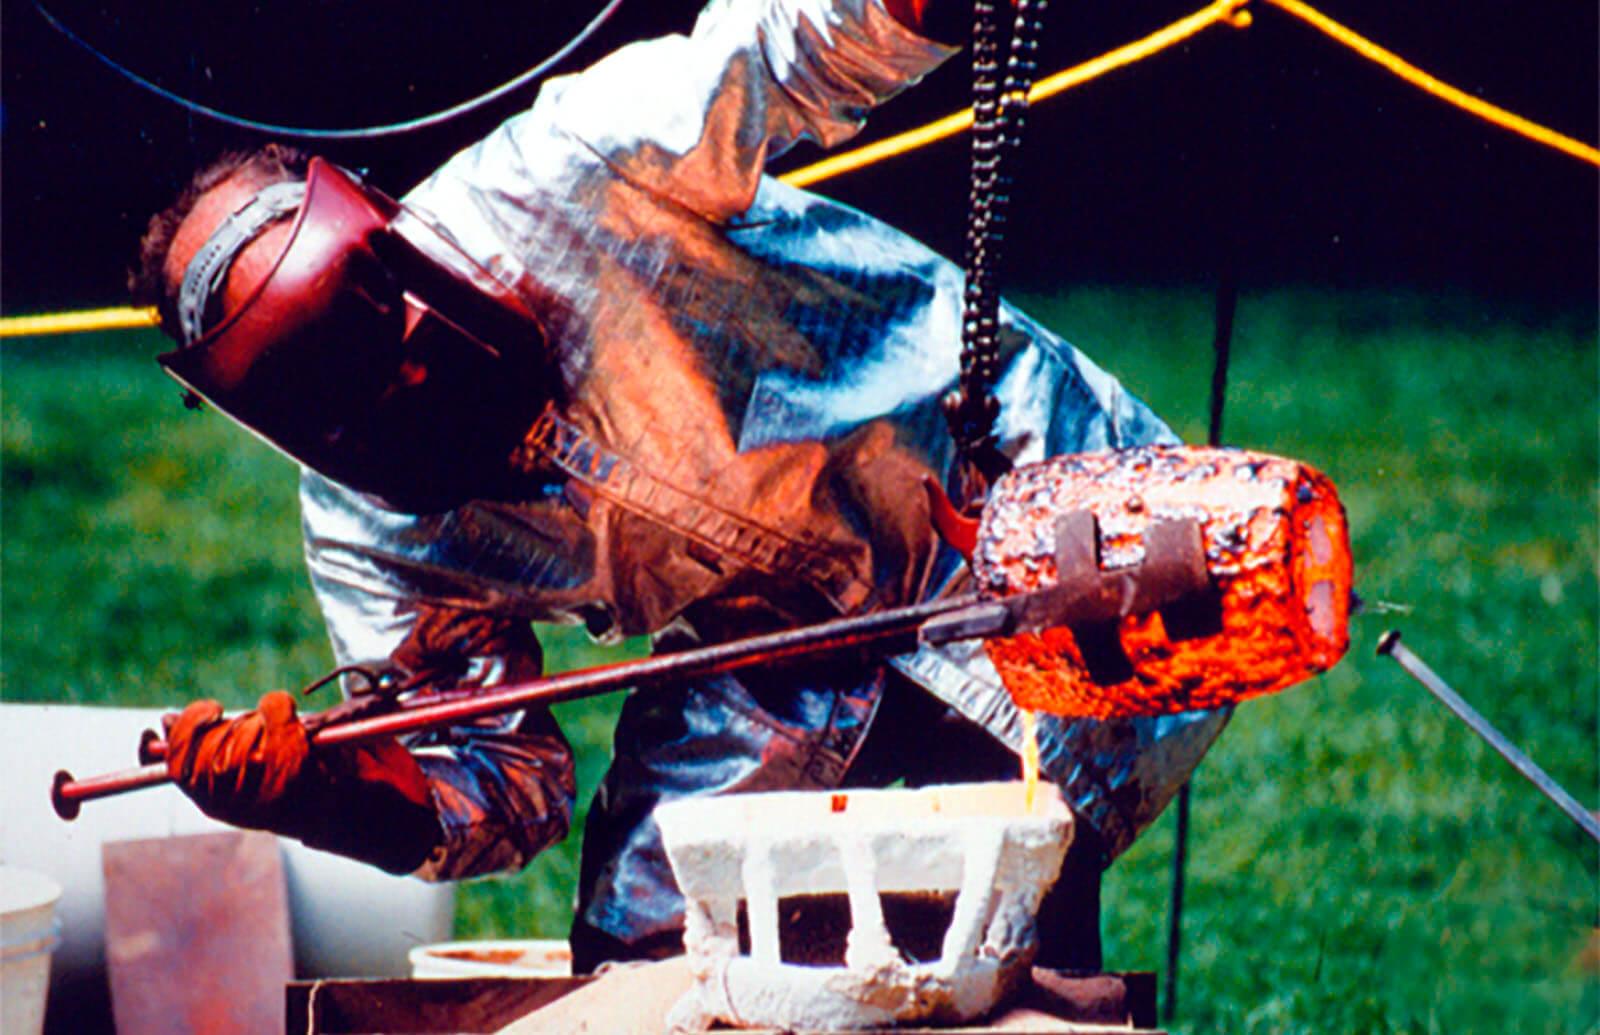 Sculptor Andrew DeVries pouring molten bronze